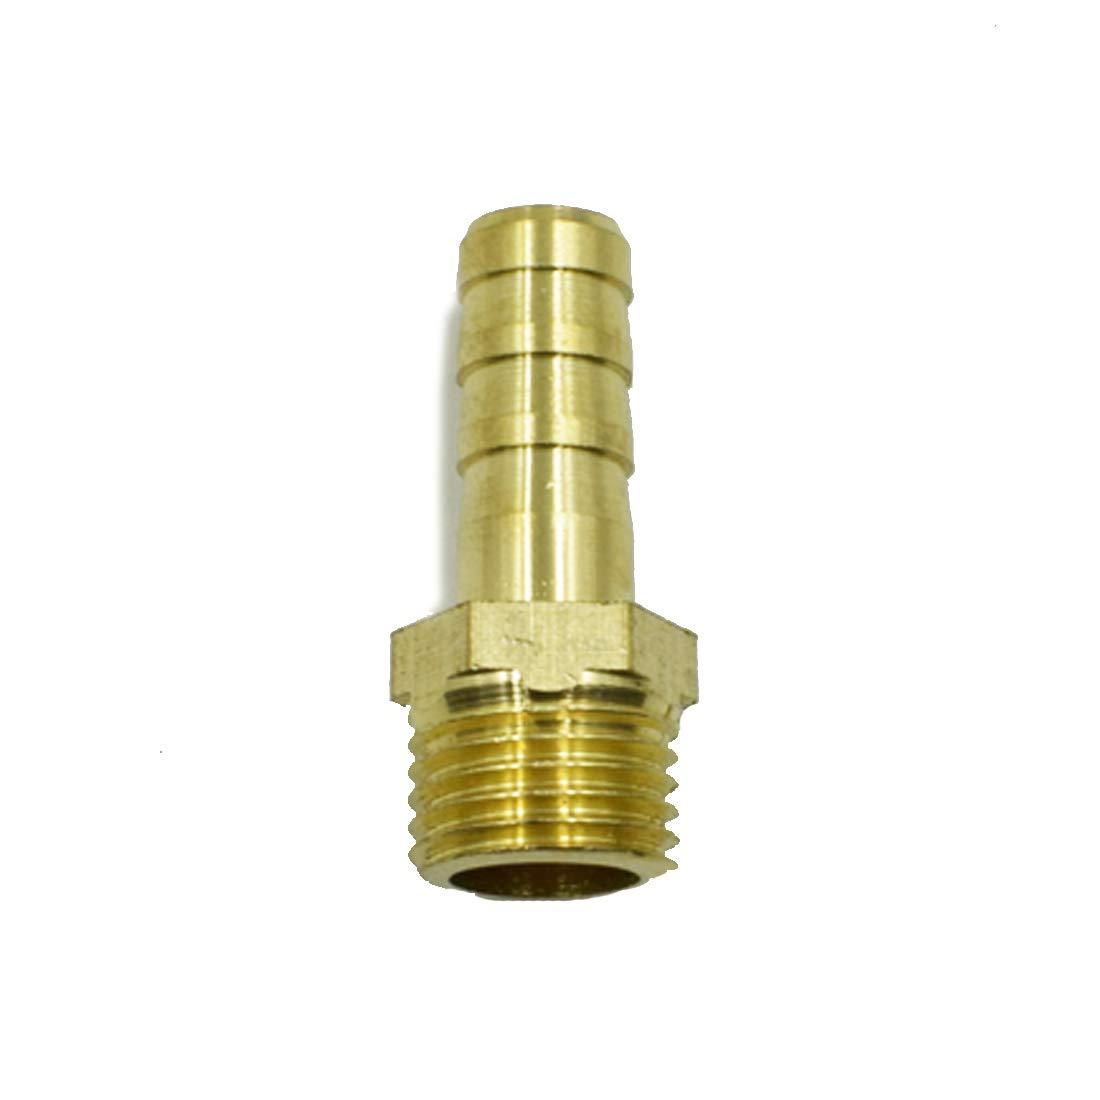 3//8 Male NPT x 3//8 Inch Hose Barb Brass Adaptor Fitting #59